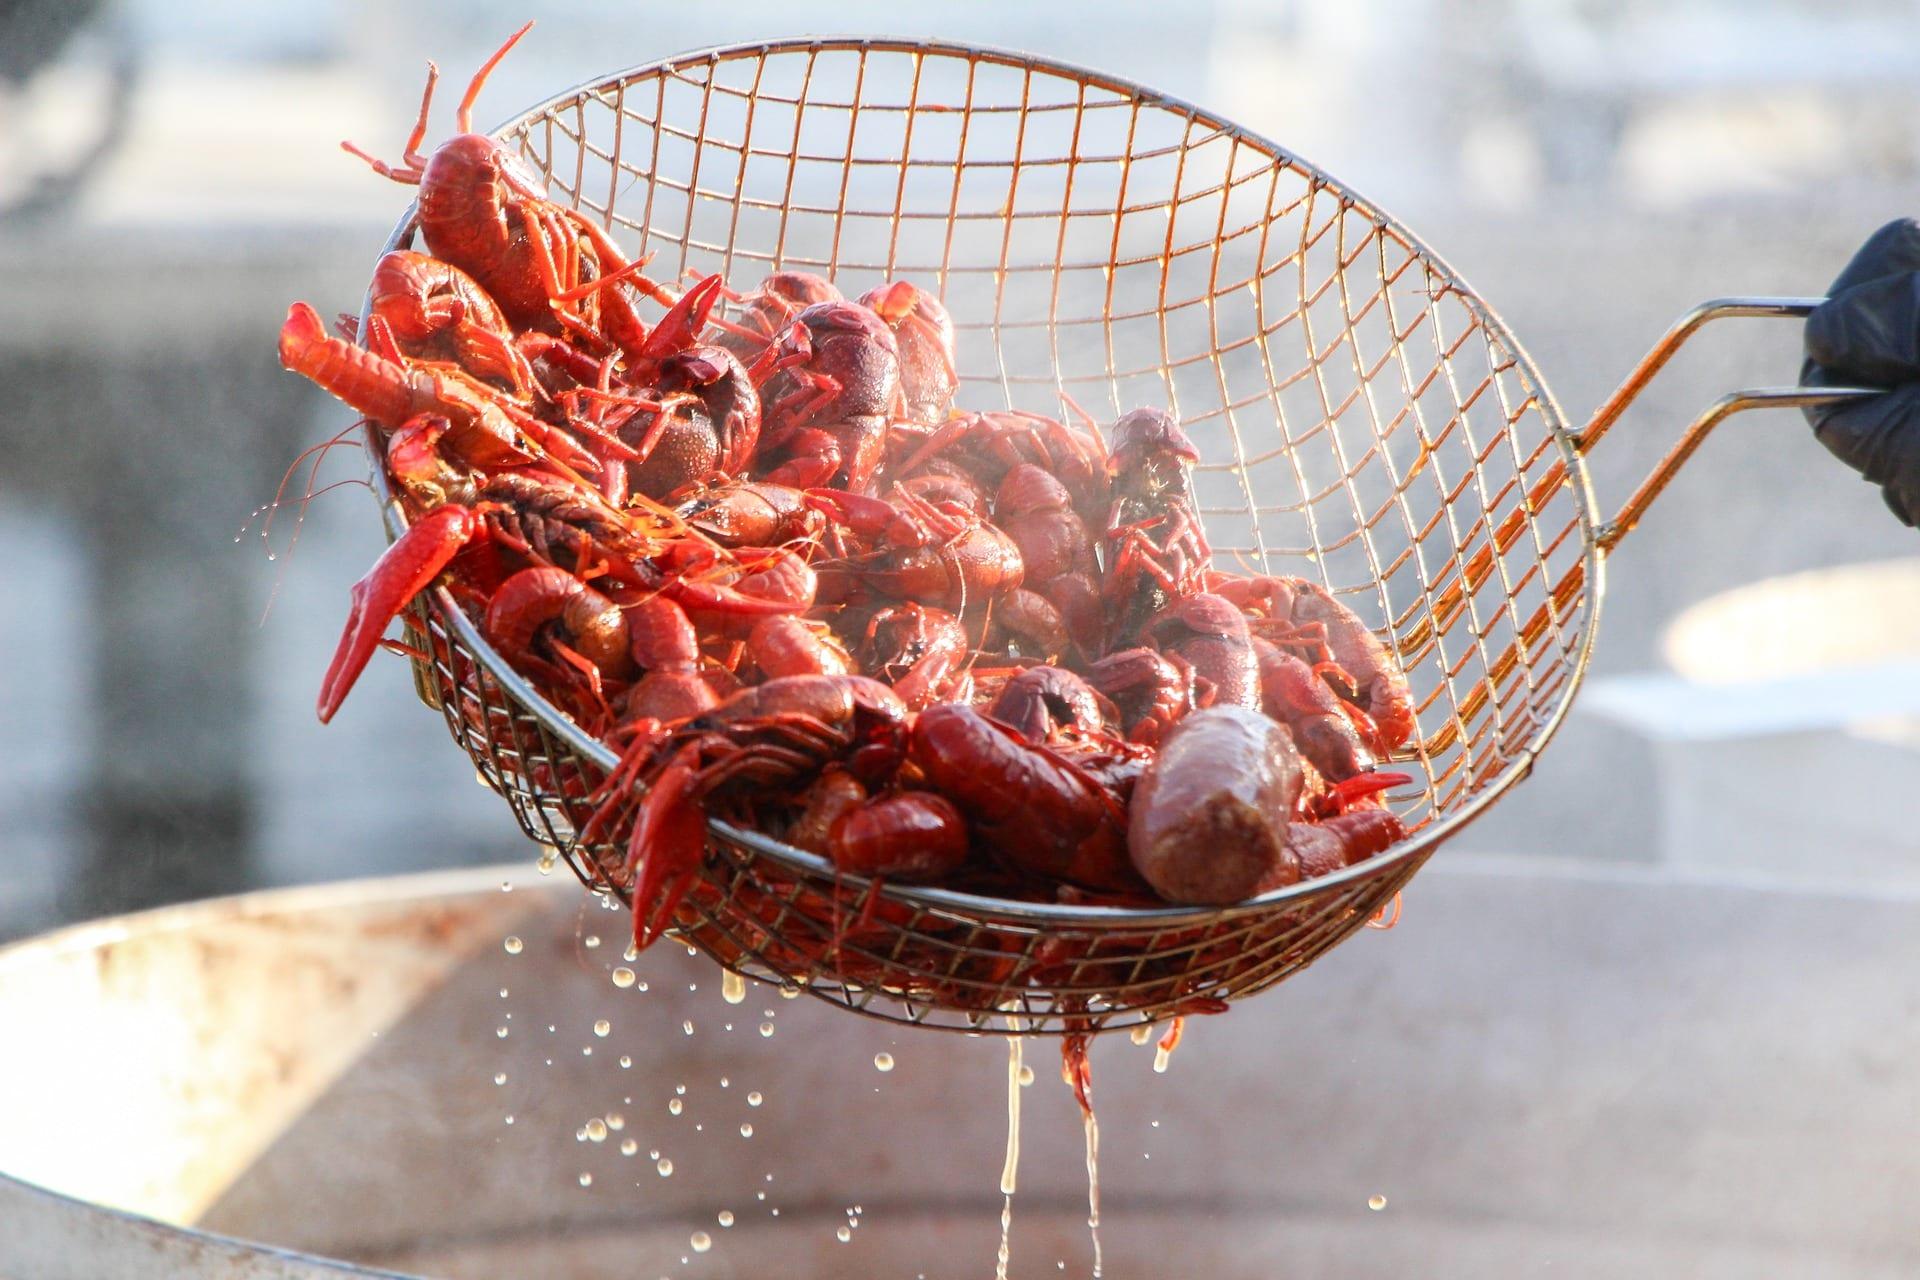 recipes for crawfish boil leftovers